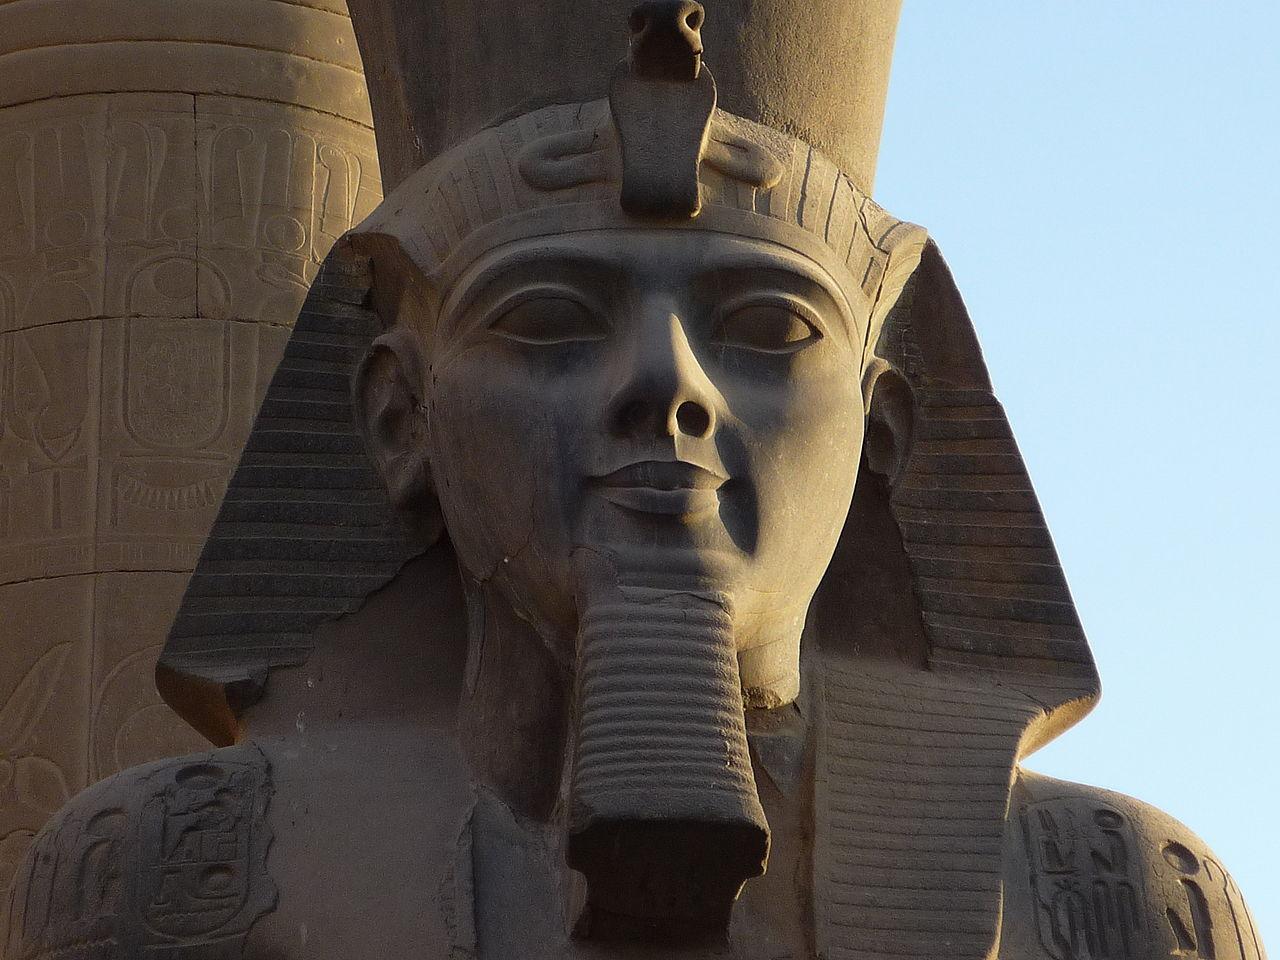 1280px-Luxor_temple24.JPG